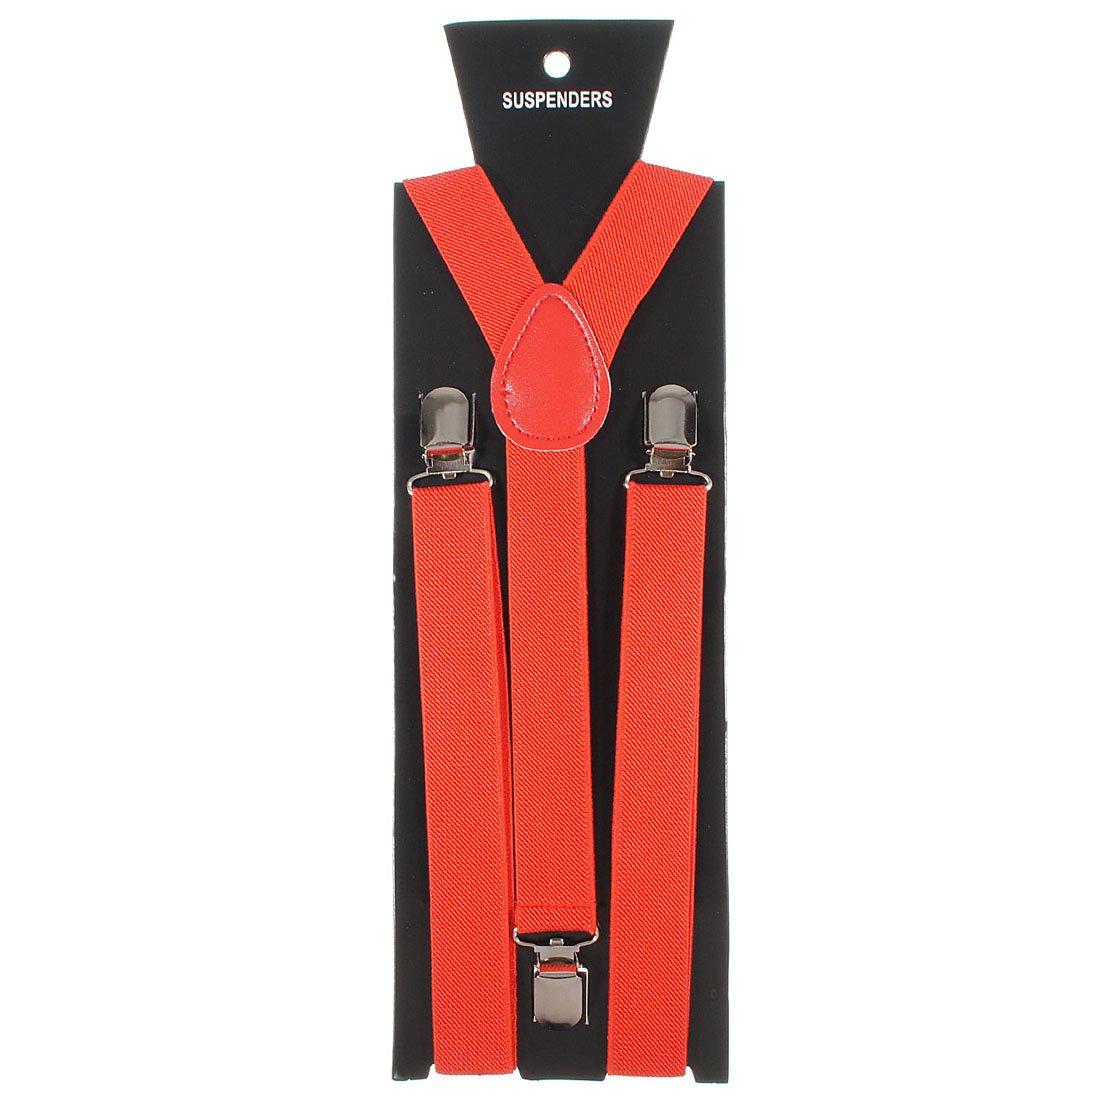 Adjustable Unisex Adult Child Elastic Clip-on Brace Suspender Y back Neon Belt,Red homeking Co. LTD PLW123